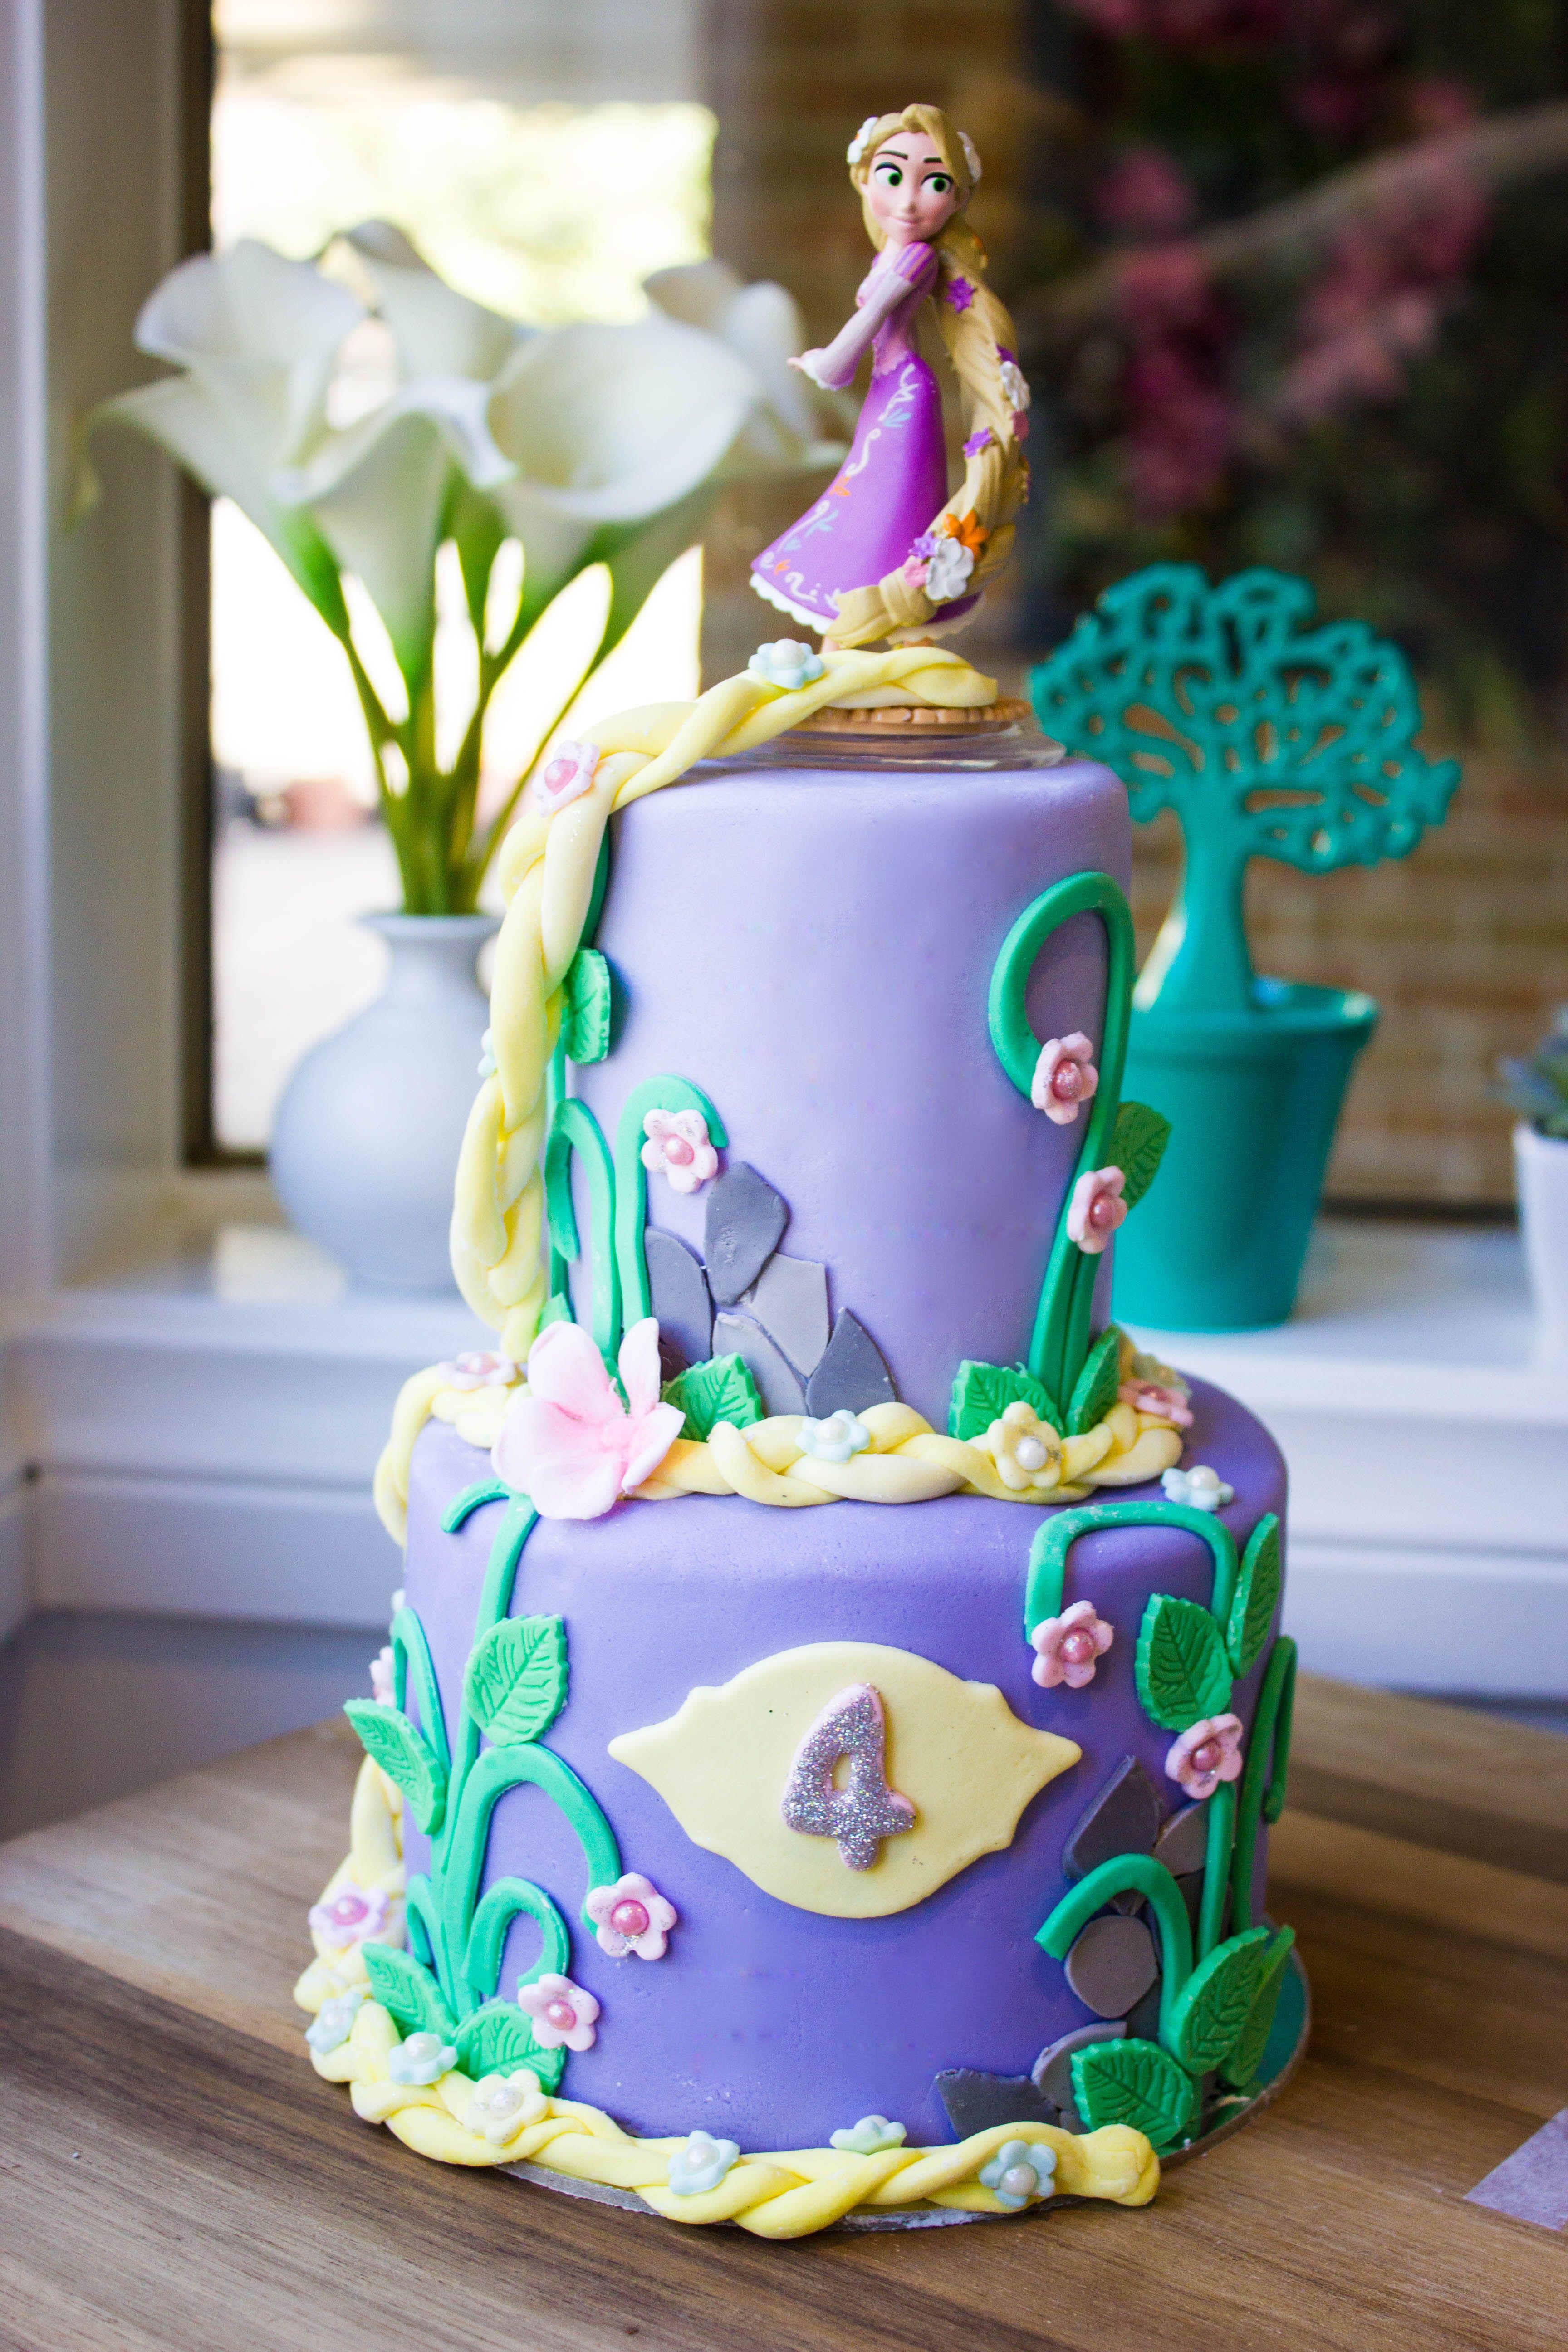 Swell Rapunzel Disney Princess Cake 65 3D Cakes Birthday Cakes 2 Birthday Cards Printable Inklcafe Filternl